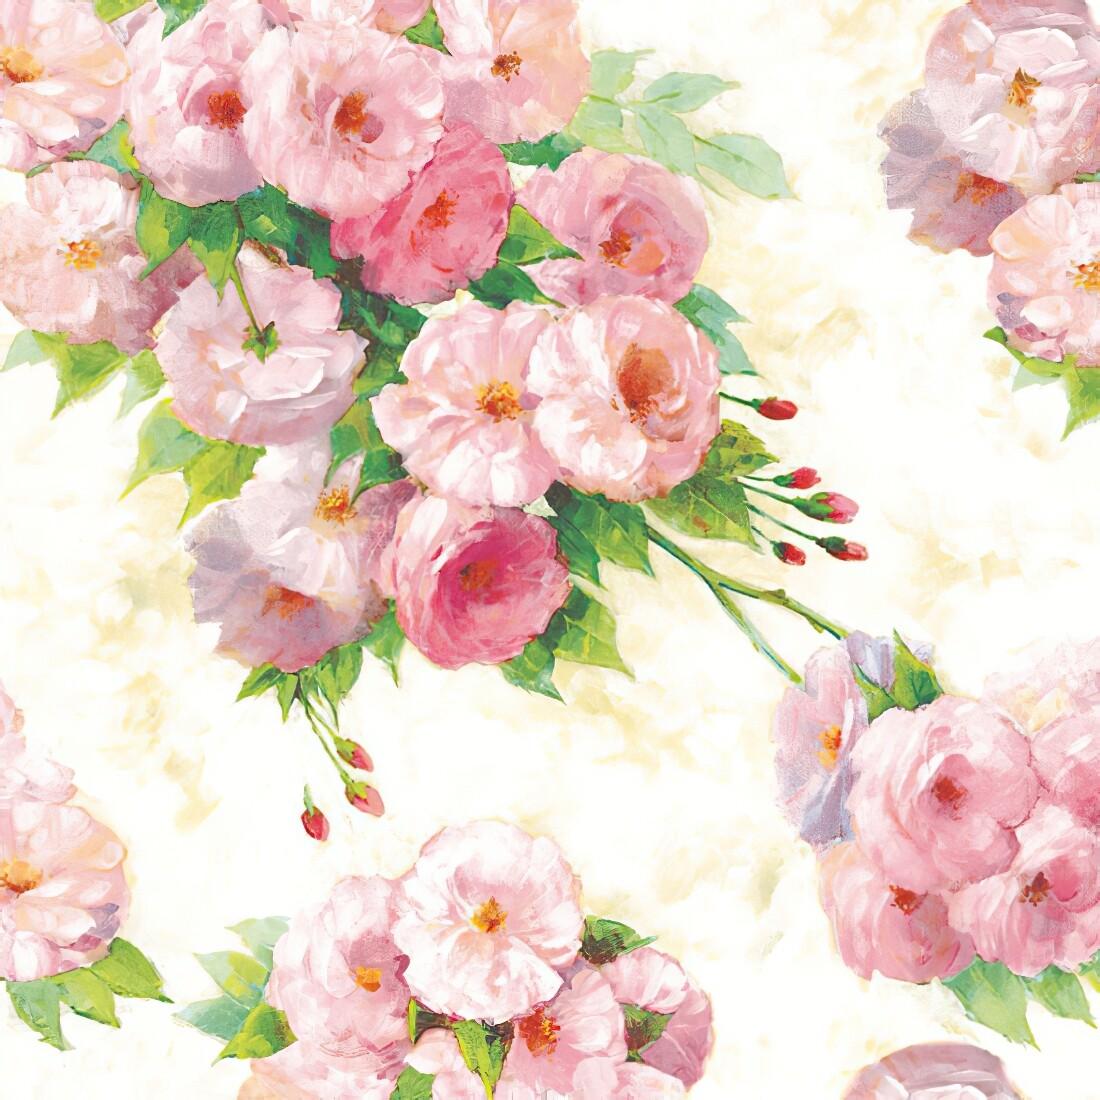 Decoupage Paper Napkins - Floral - Arianna Cream 13x13 (1 Sheet)